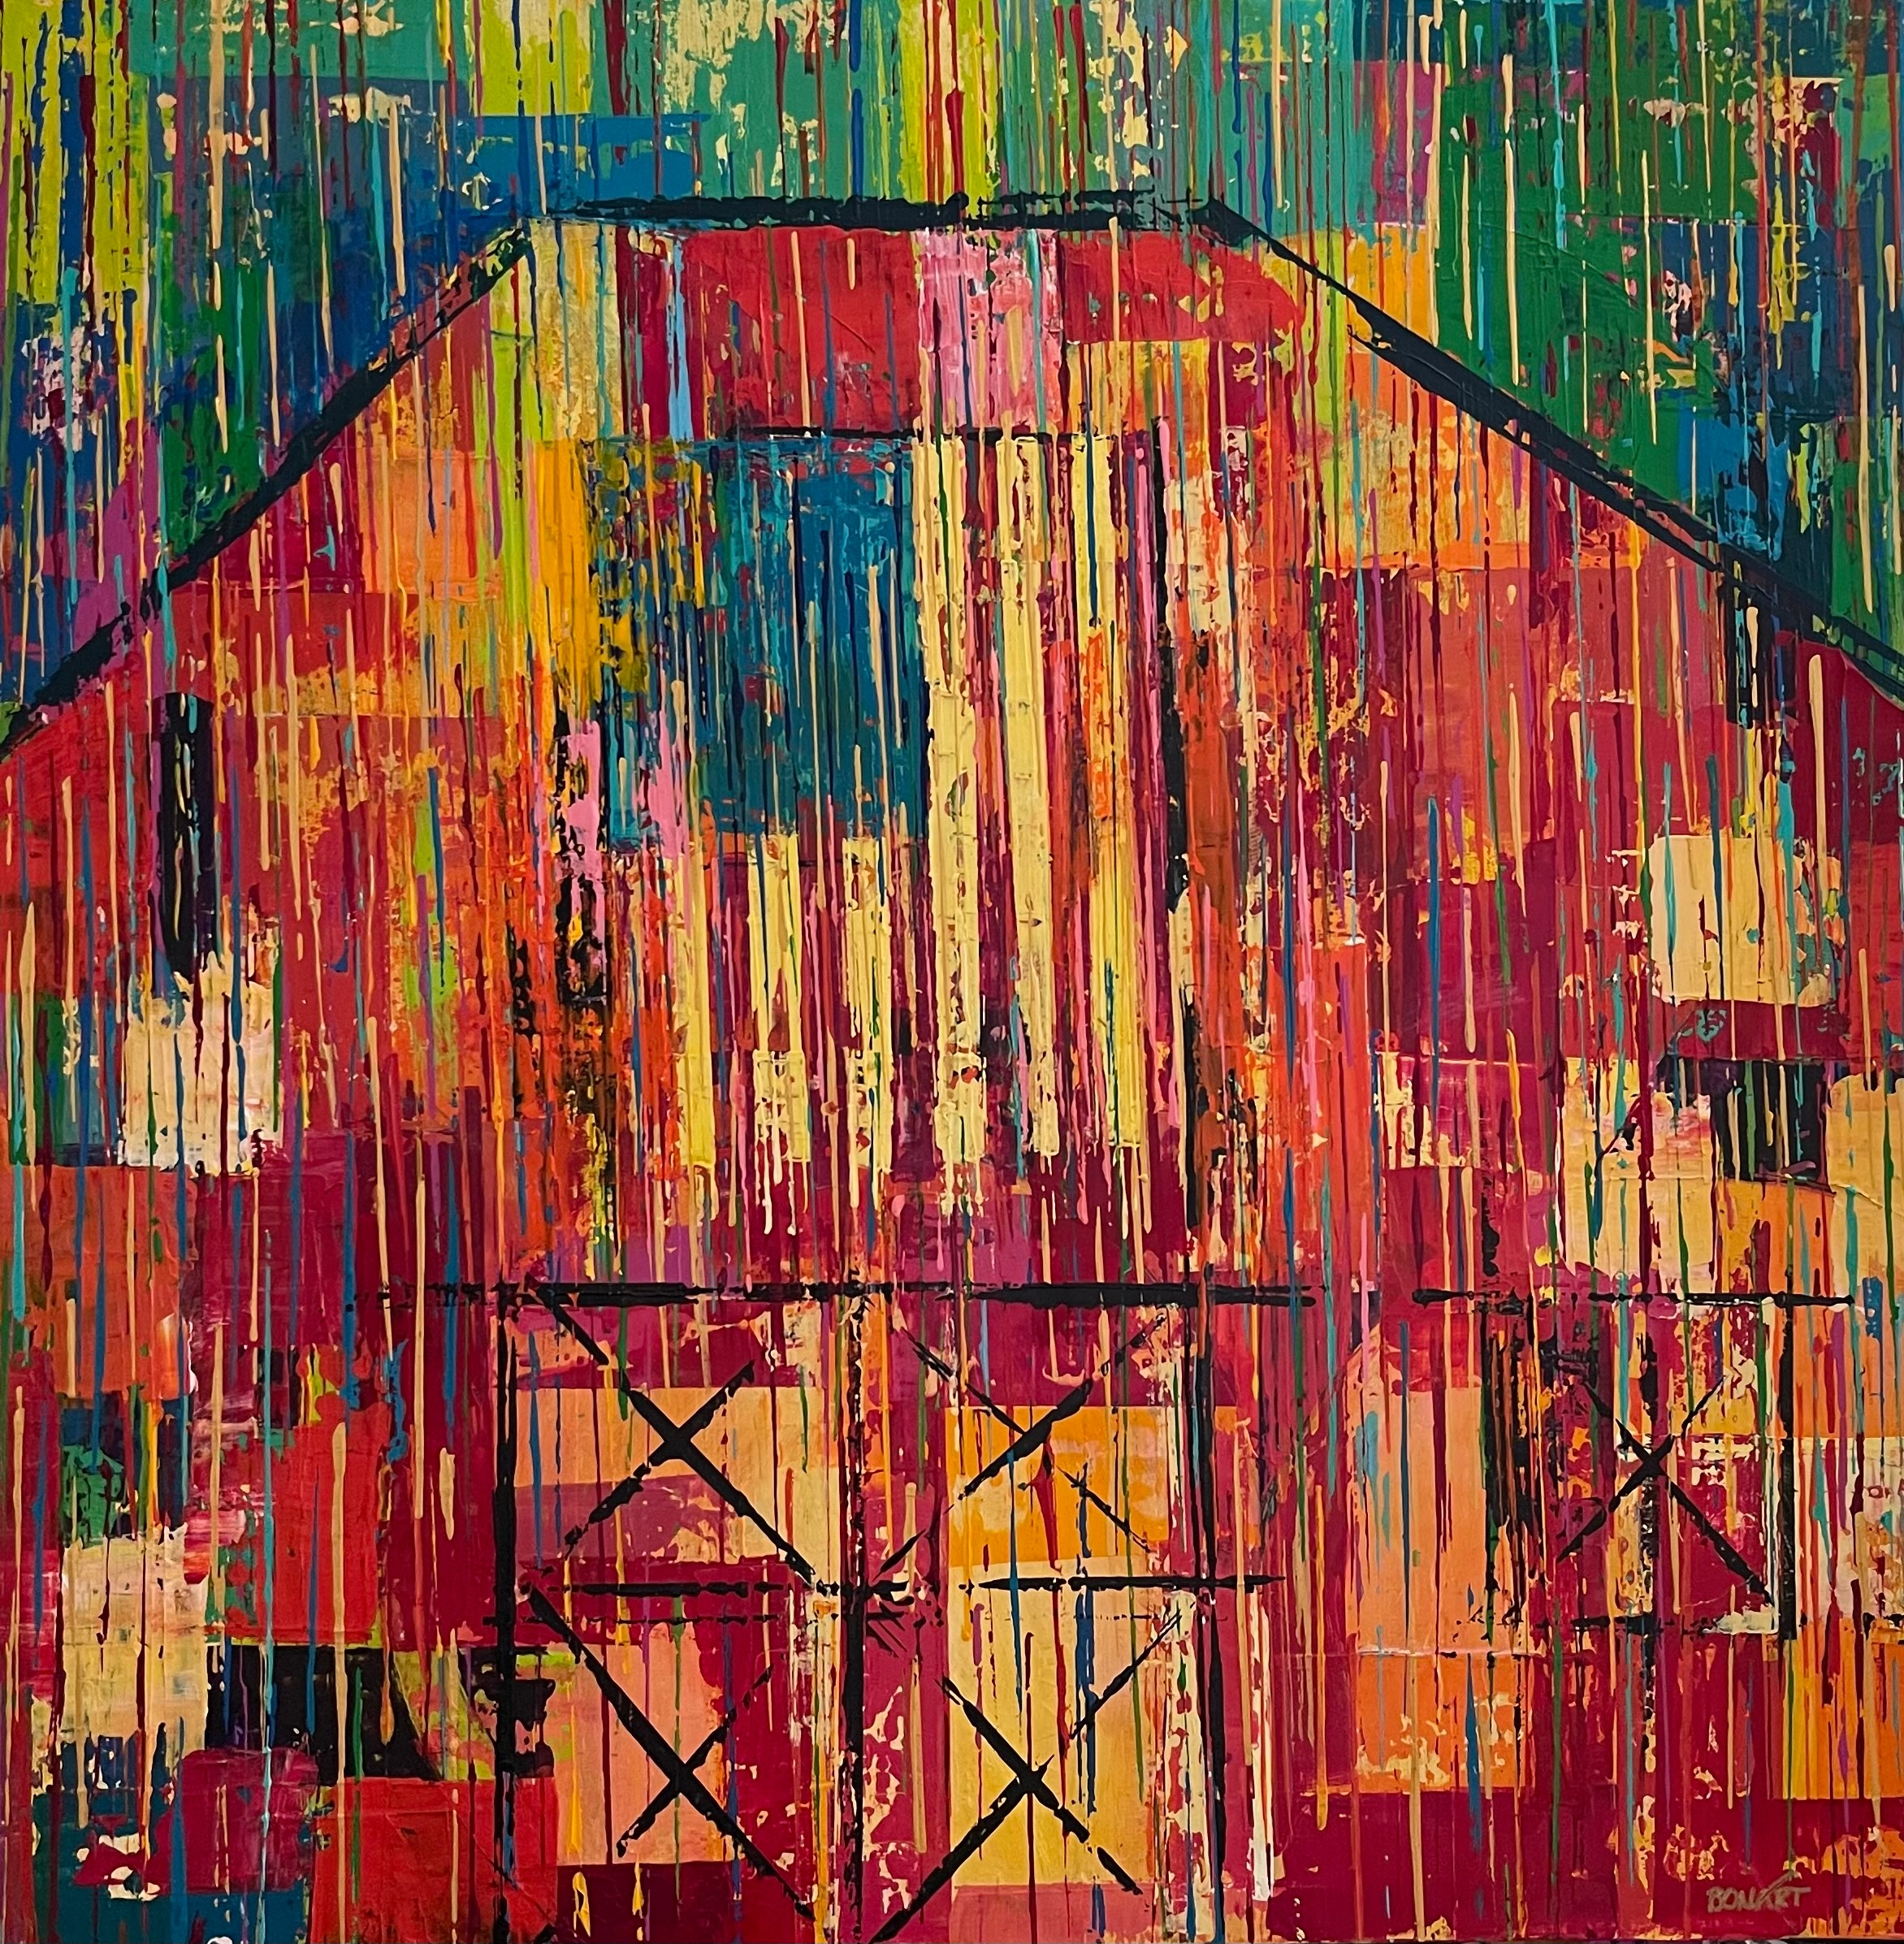 Patchwork barn cbmn34